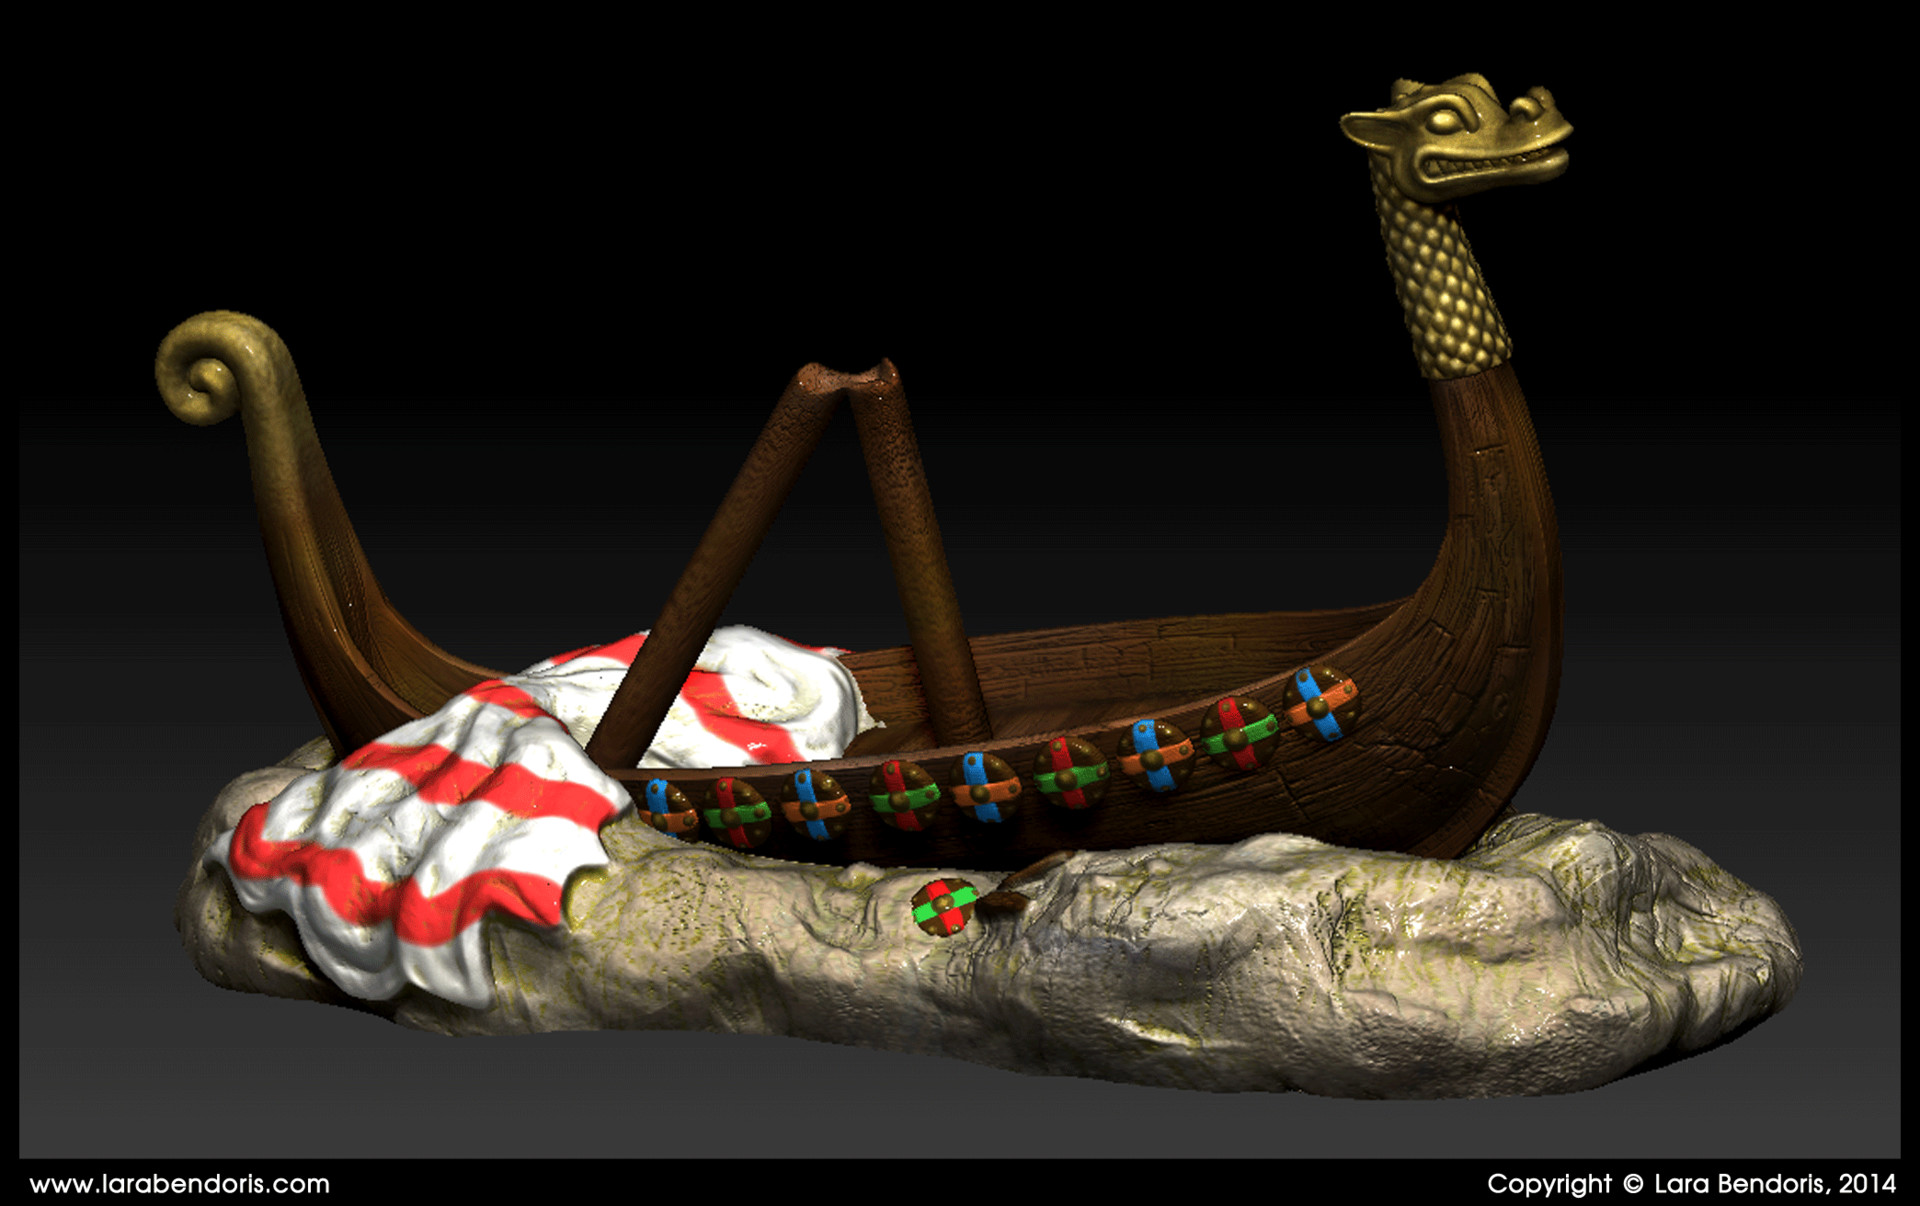 Lara bendoris vikingship